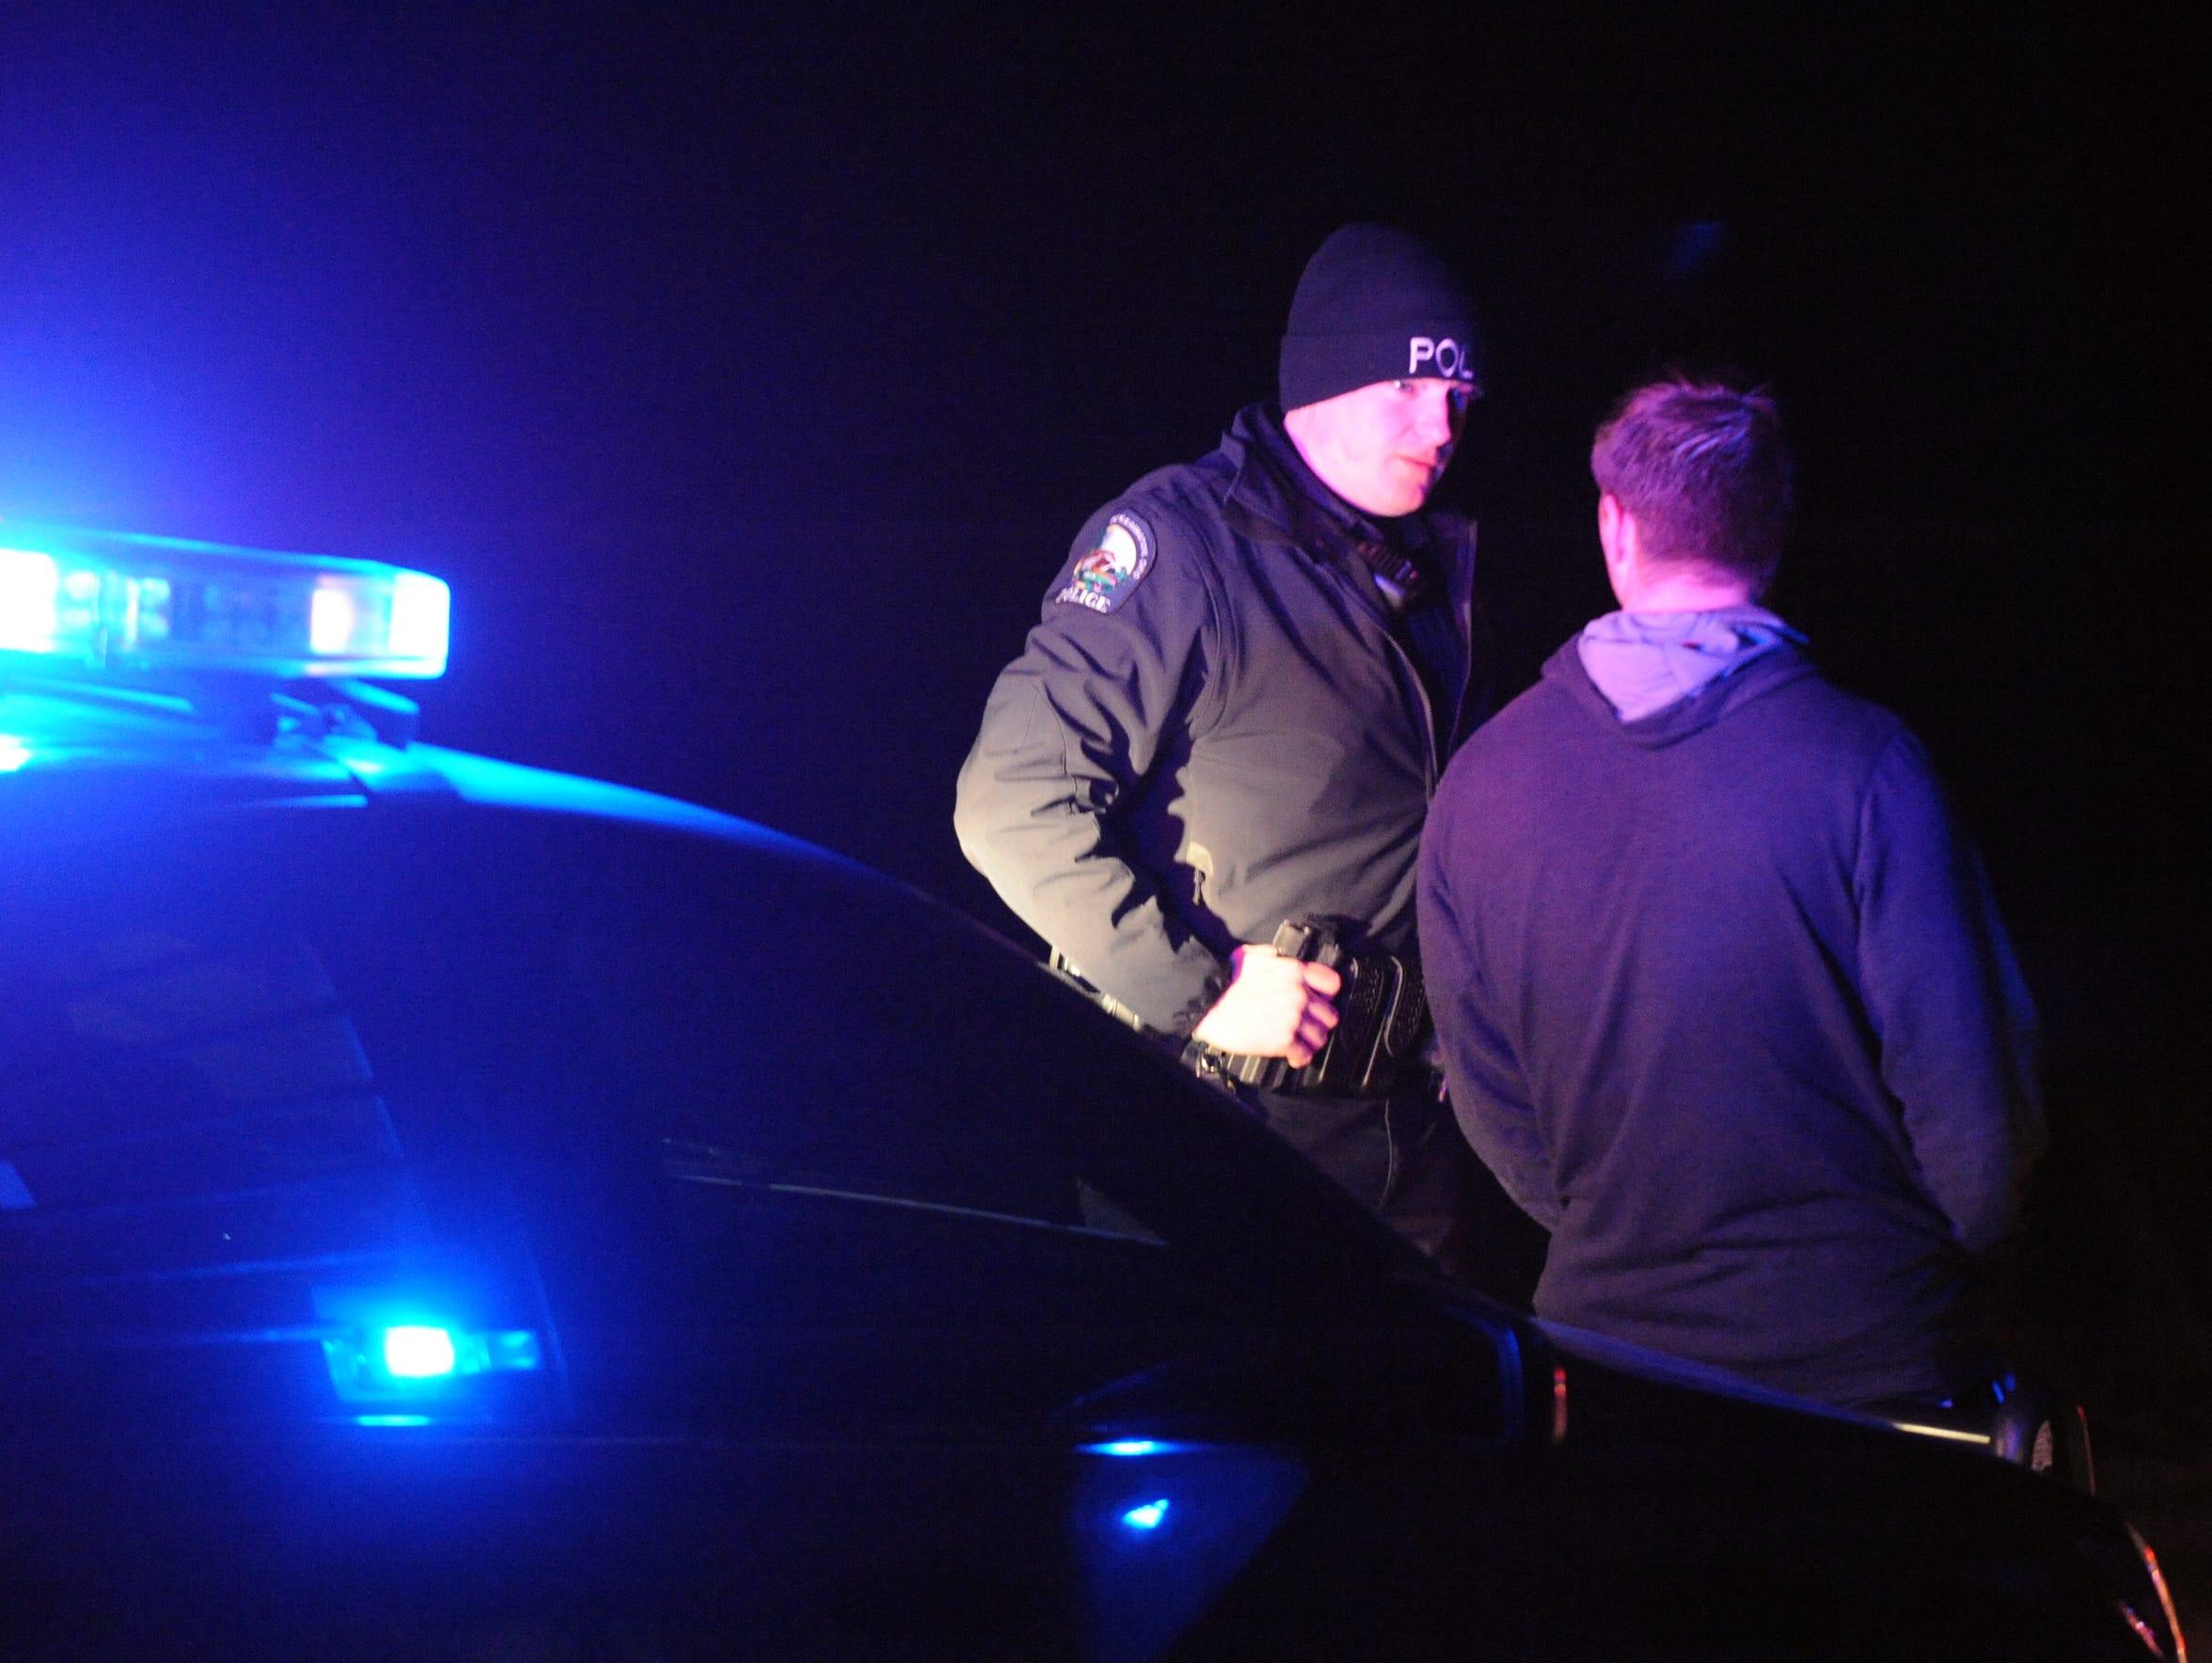 A Pickerington Police Officer talks to a passenger